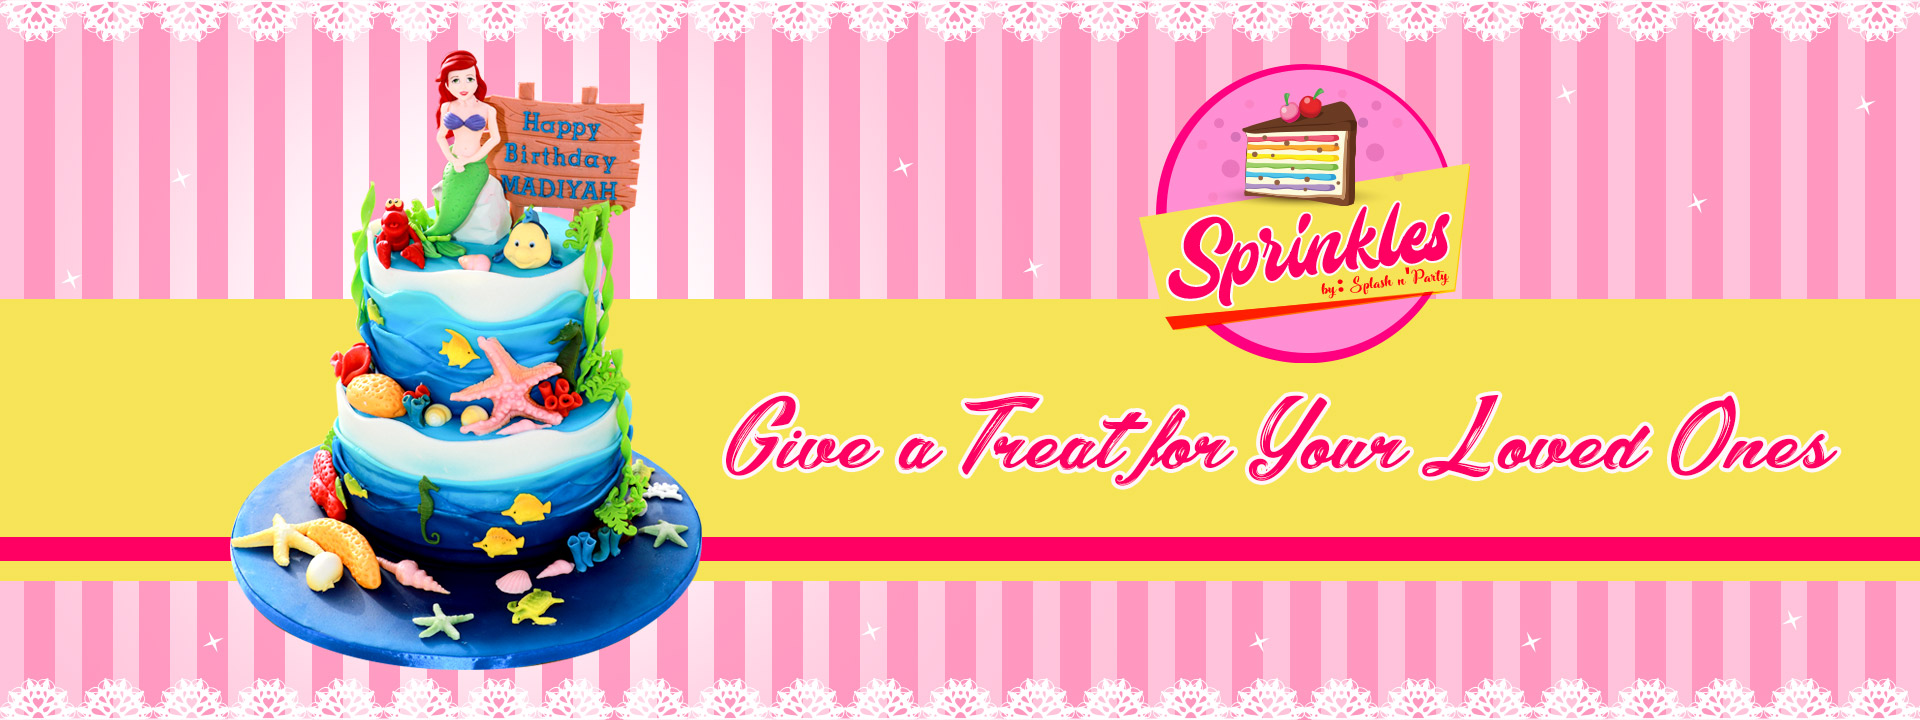 Sprinkles Cake Shops In Dubai Fabulous Cakes Cake Delivery